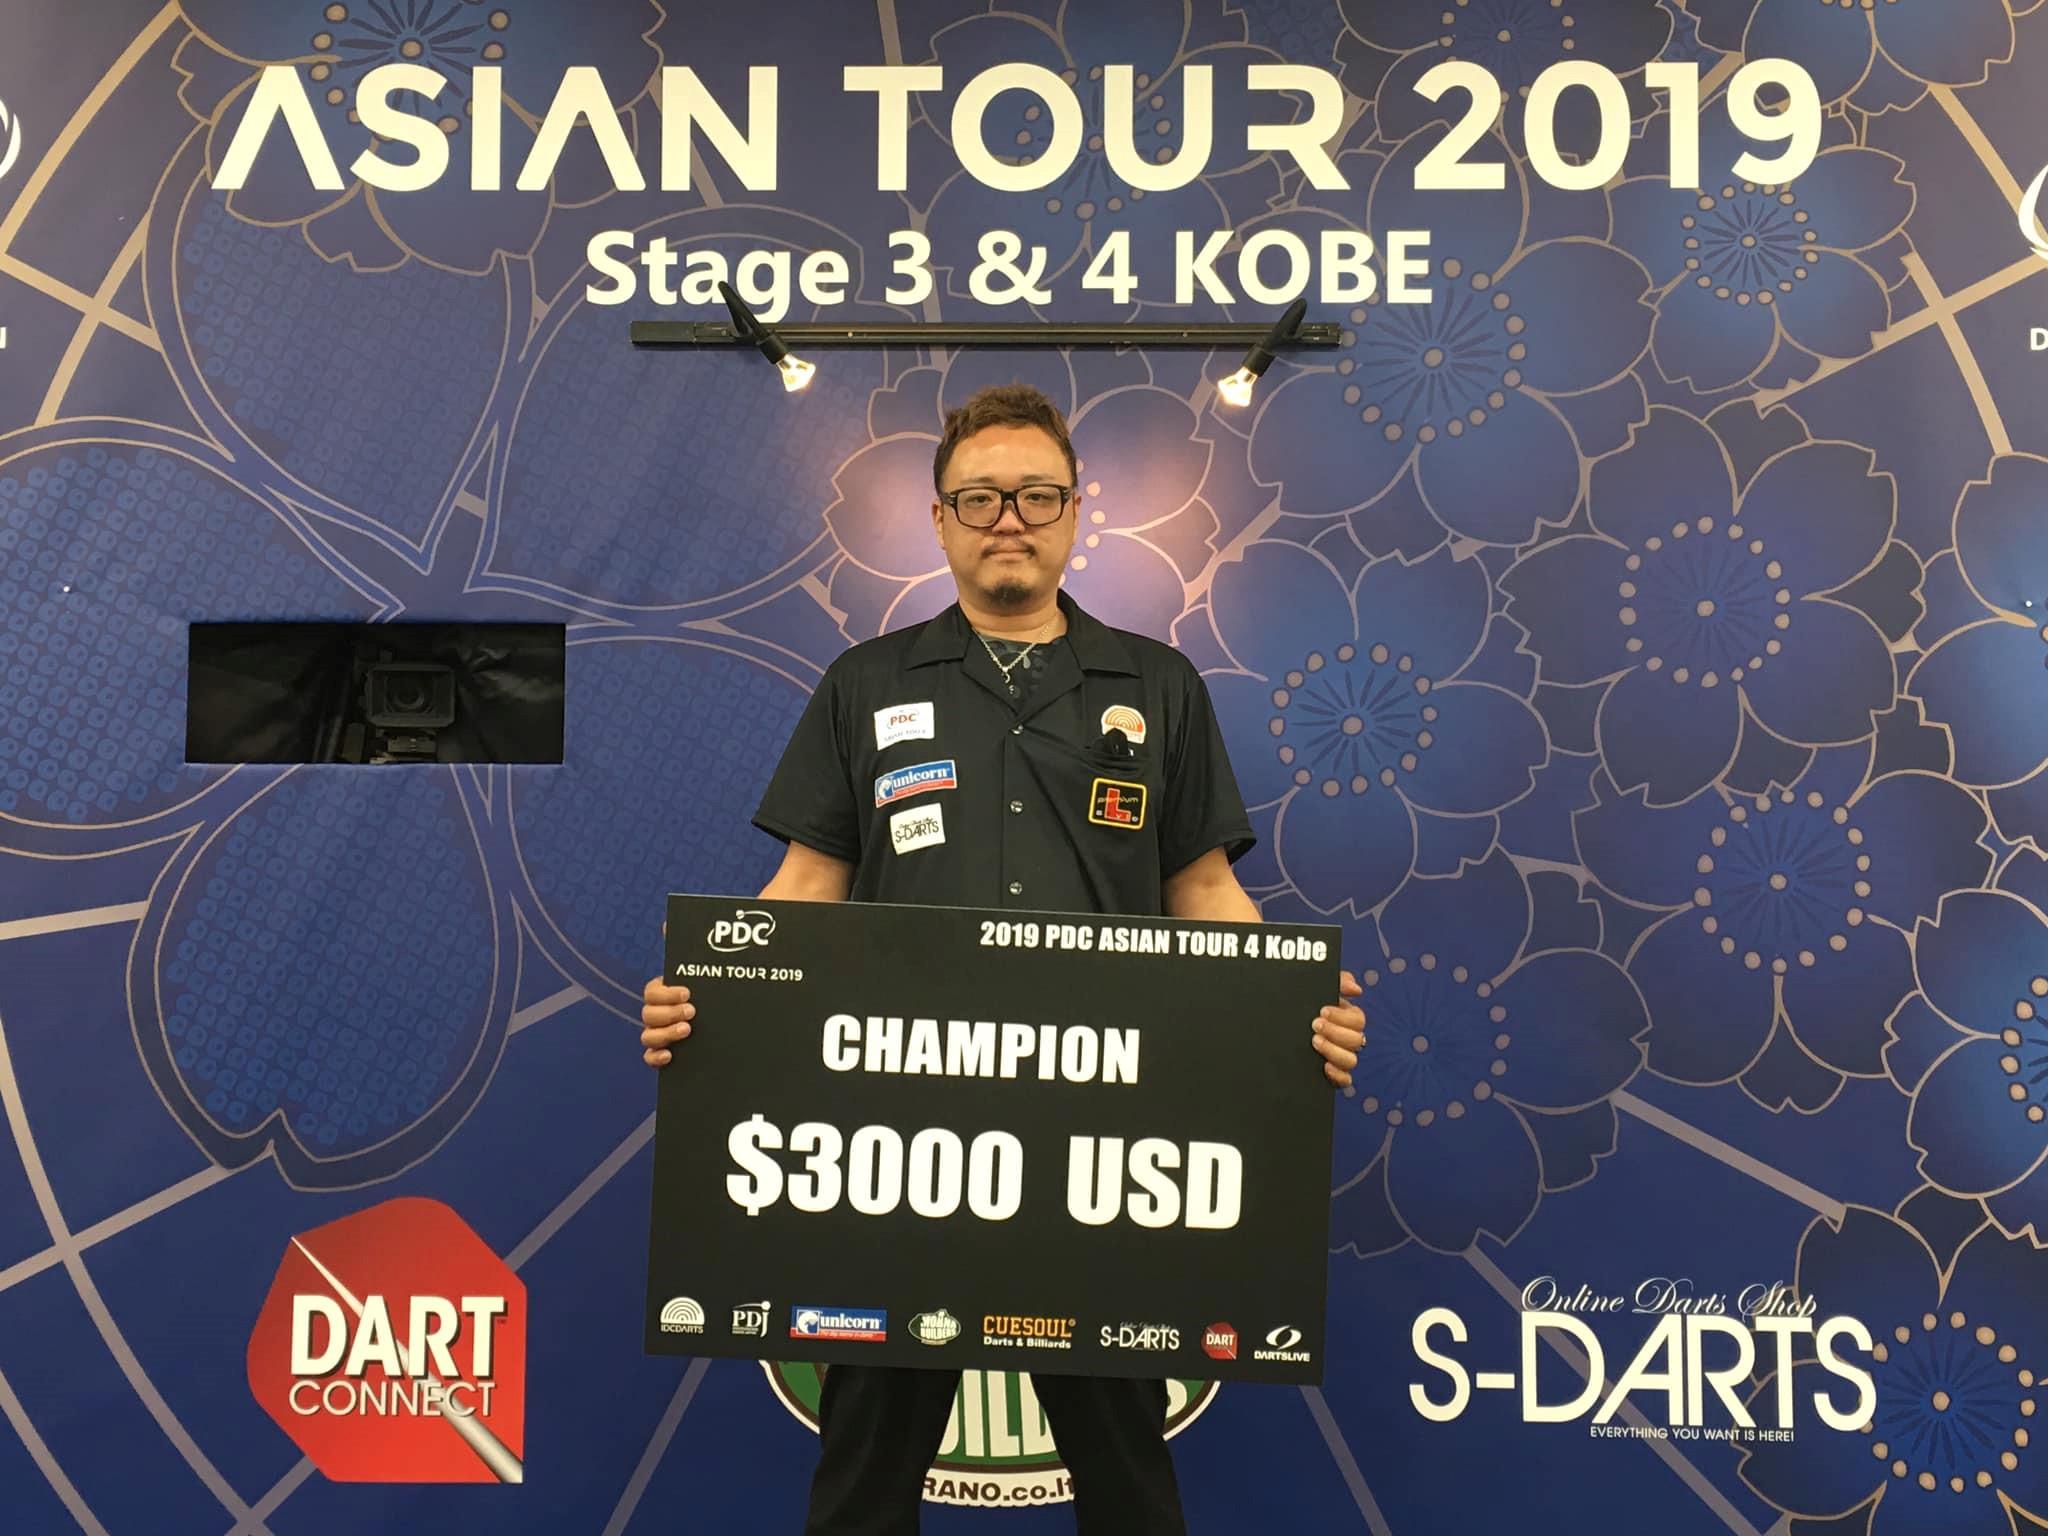 Latest Team Unicorn news as Asada wins in Asia